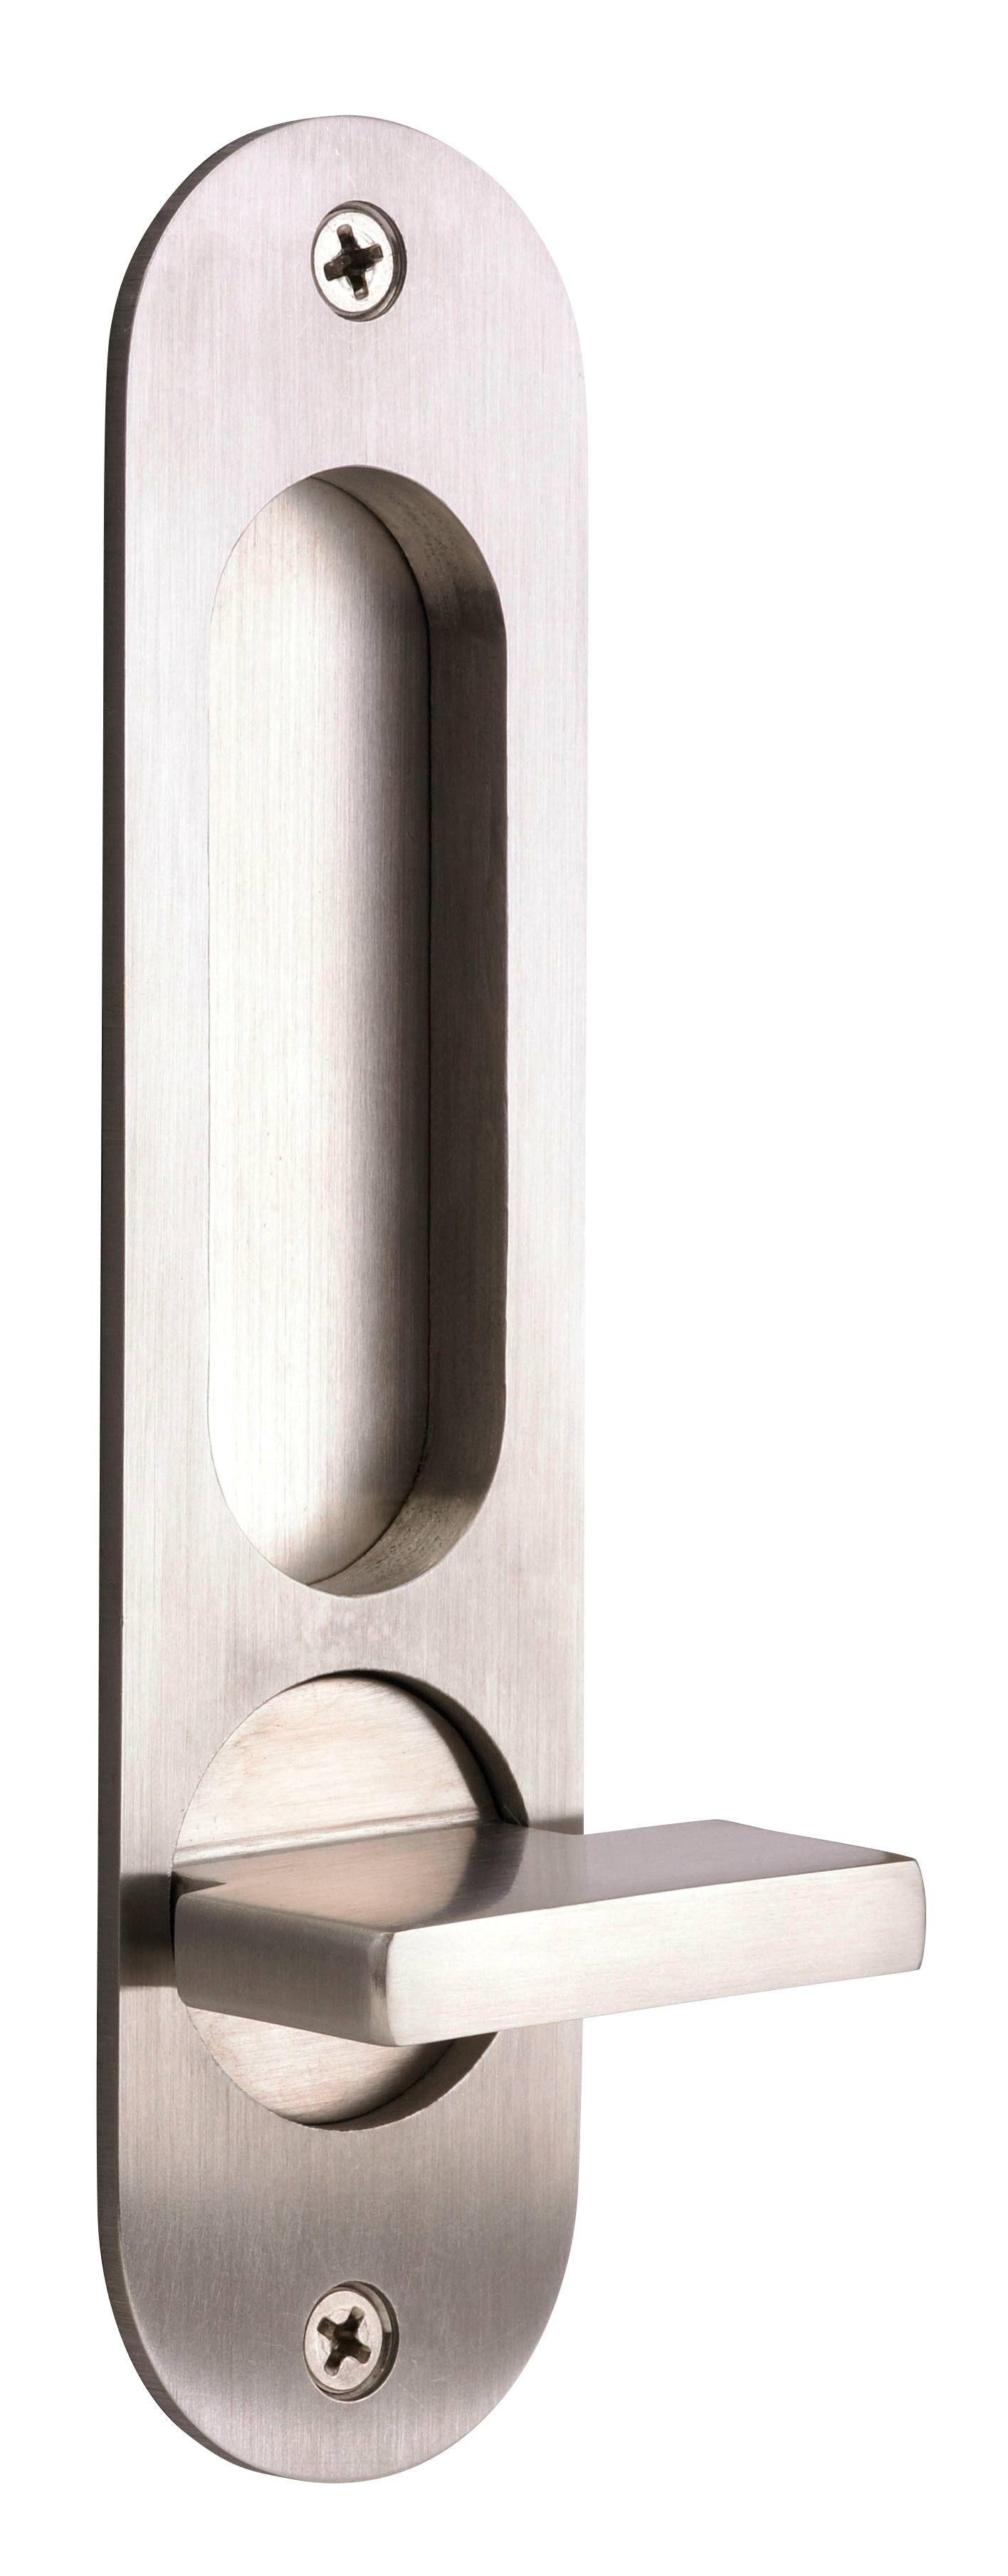 Linnea PL160 (With AD Turn Piece) Pocket Door Hardware ADA